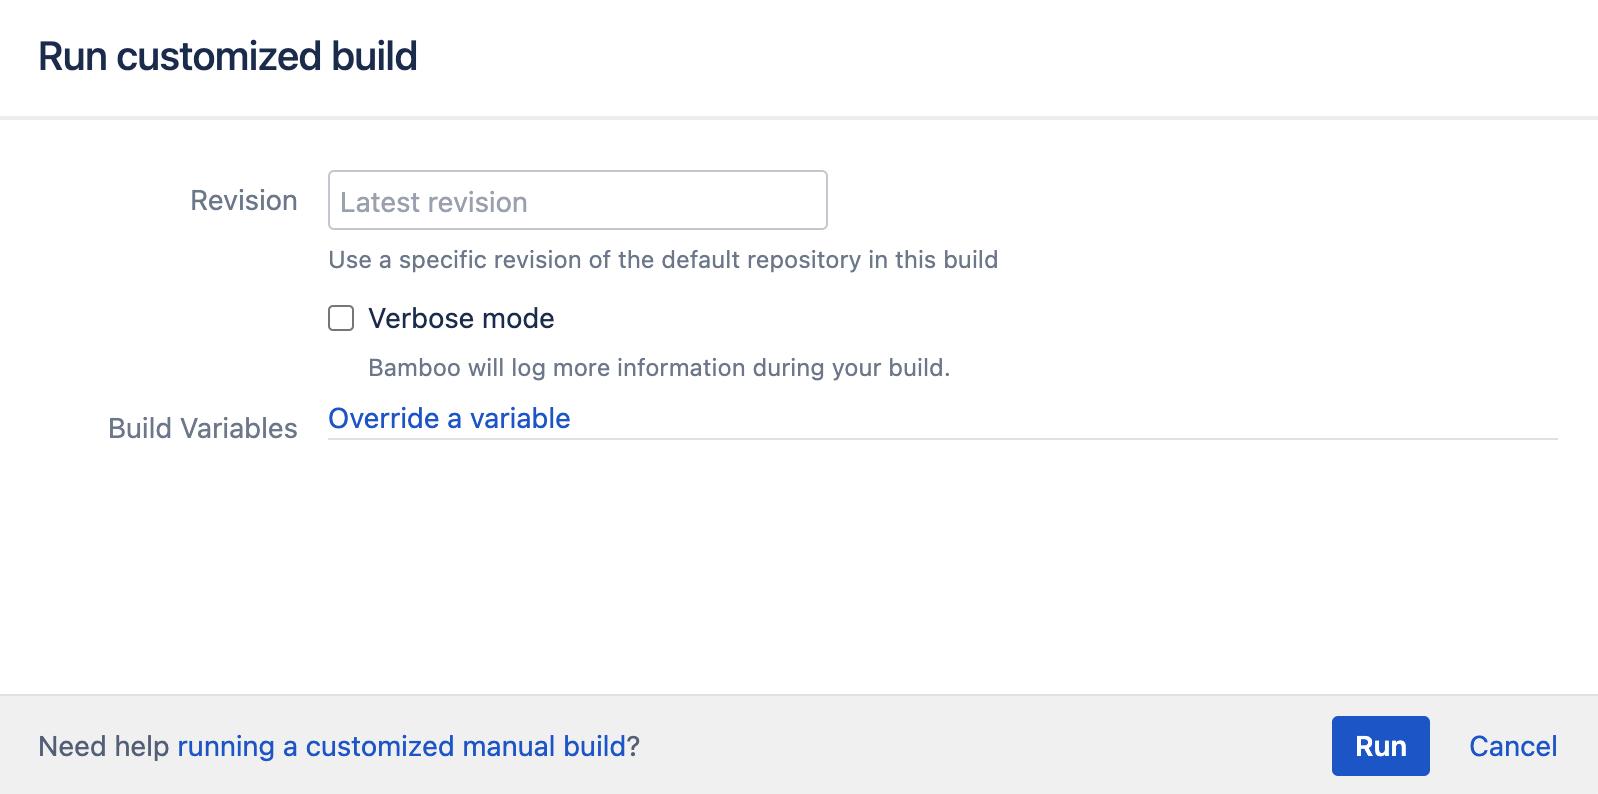 Customized build configuration screen